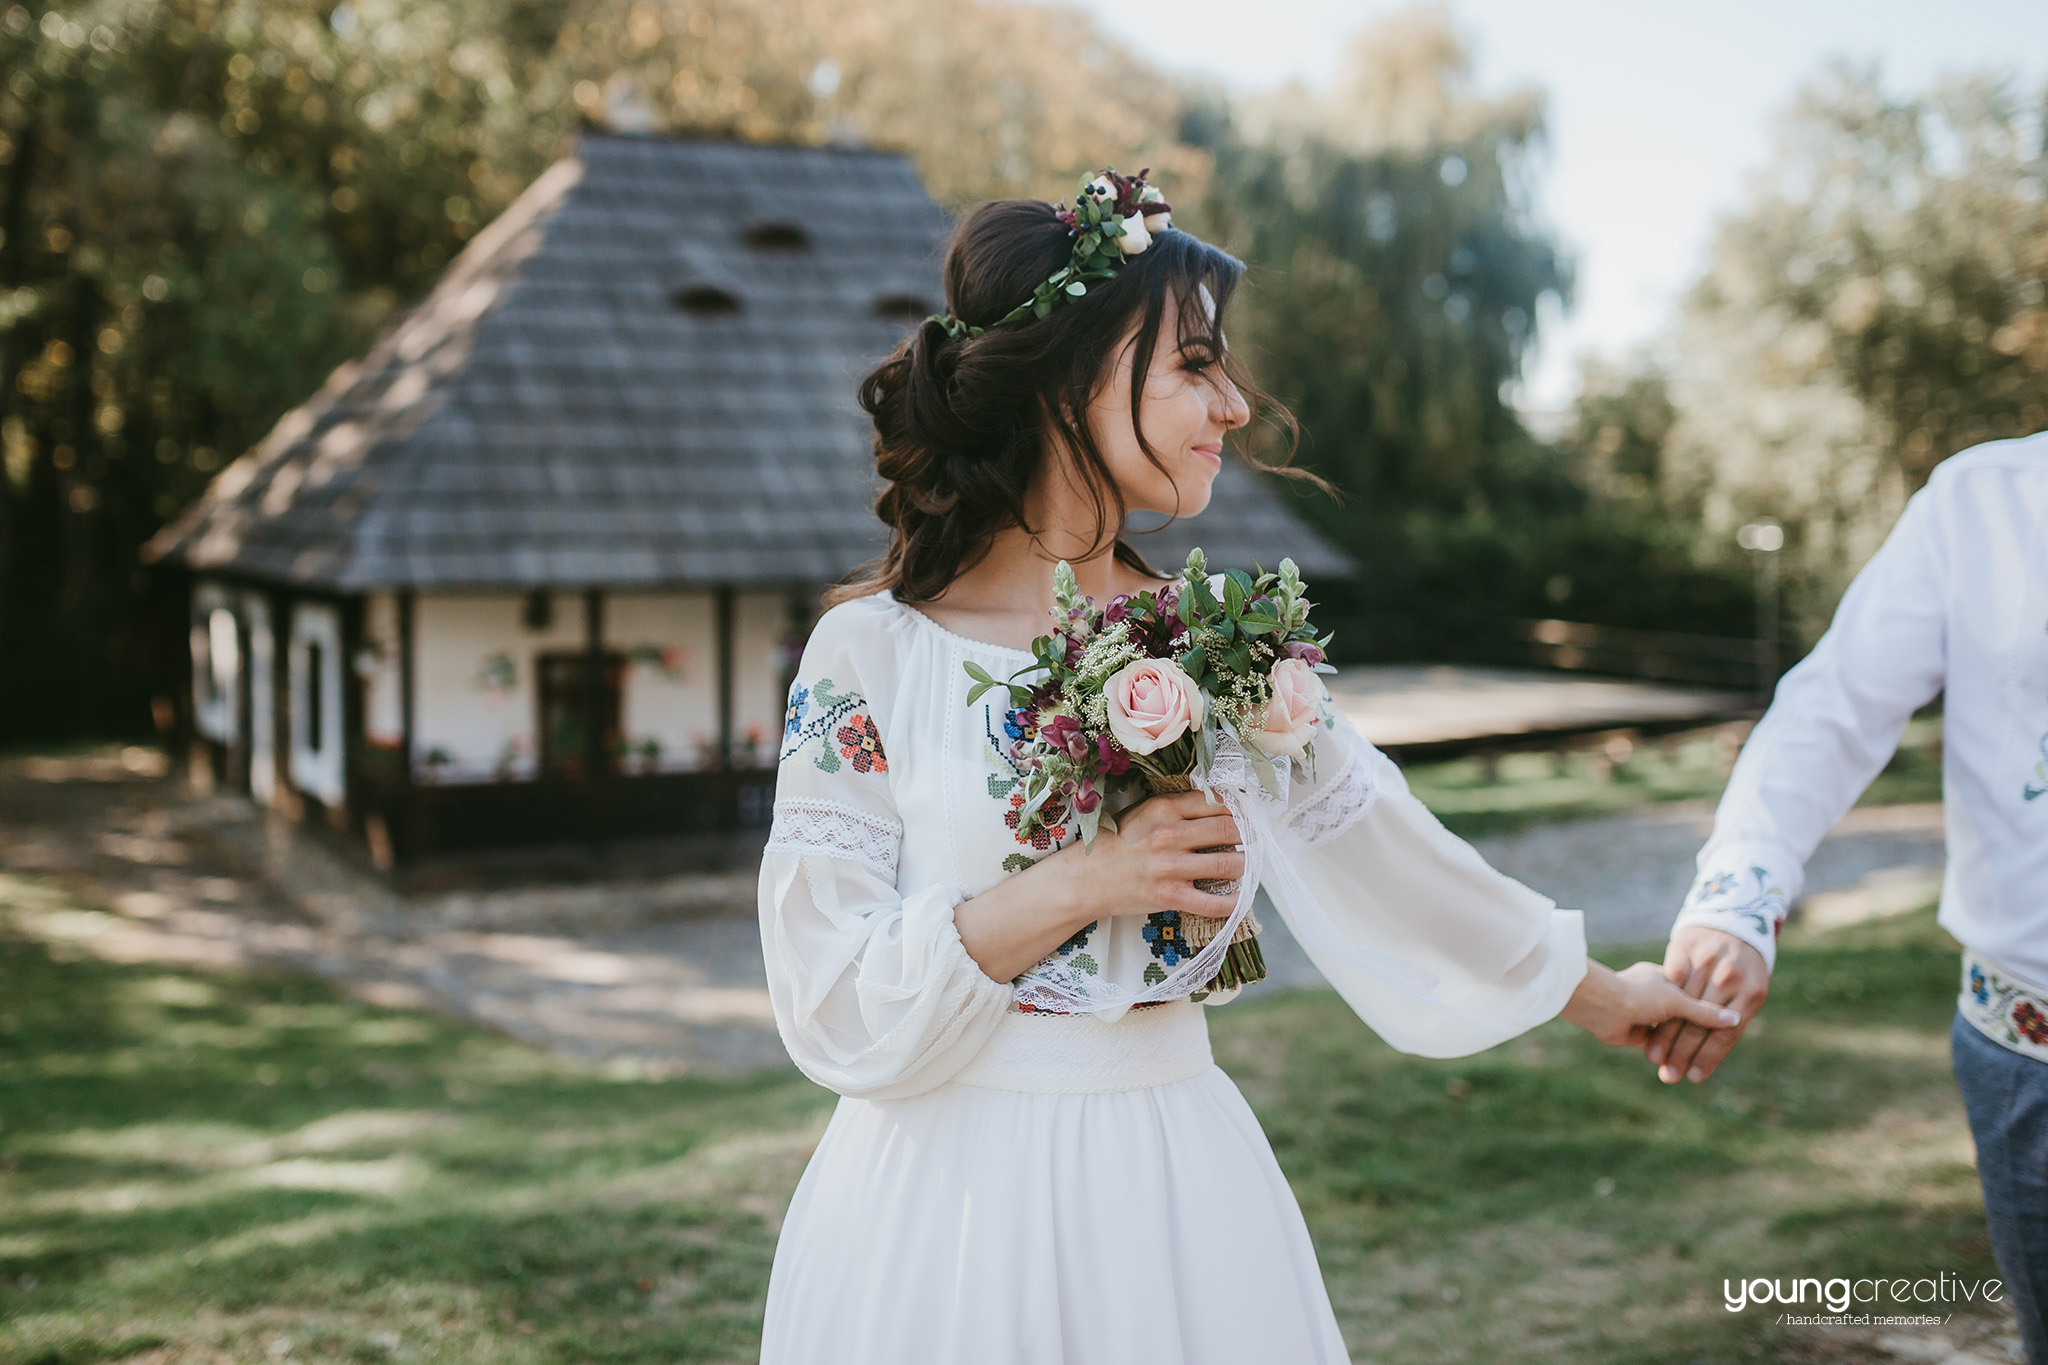 Luminita & Emanuel   youngcreative.info media © Dan Filipciuc, Cristina Bejan   fotografie nunta Suceava